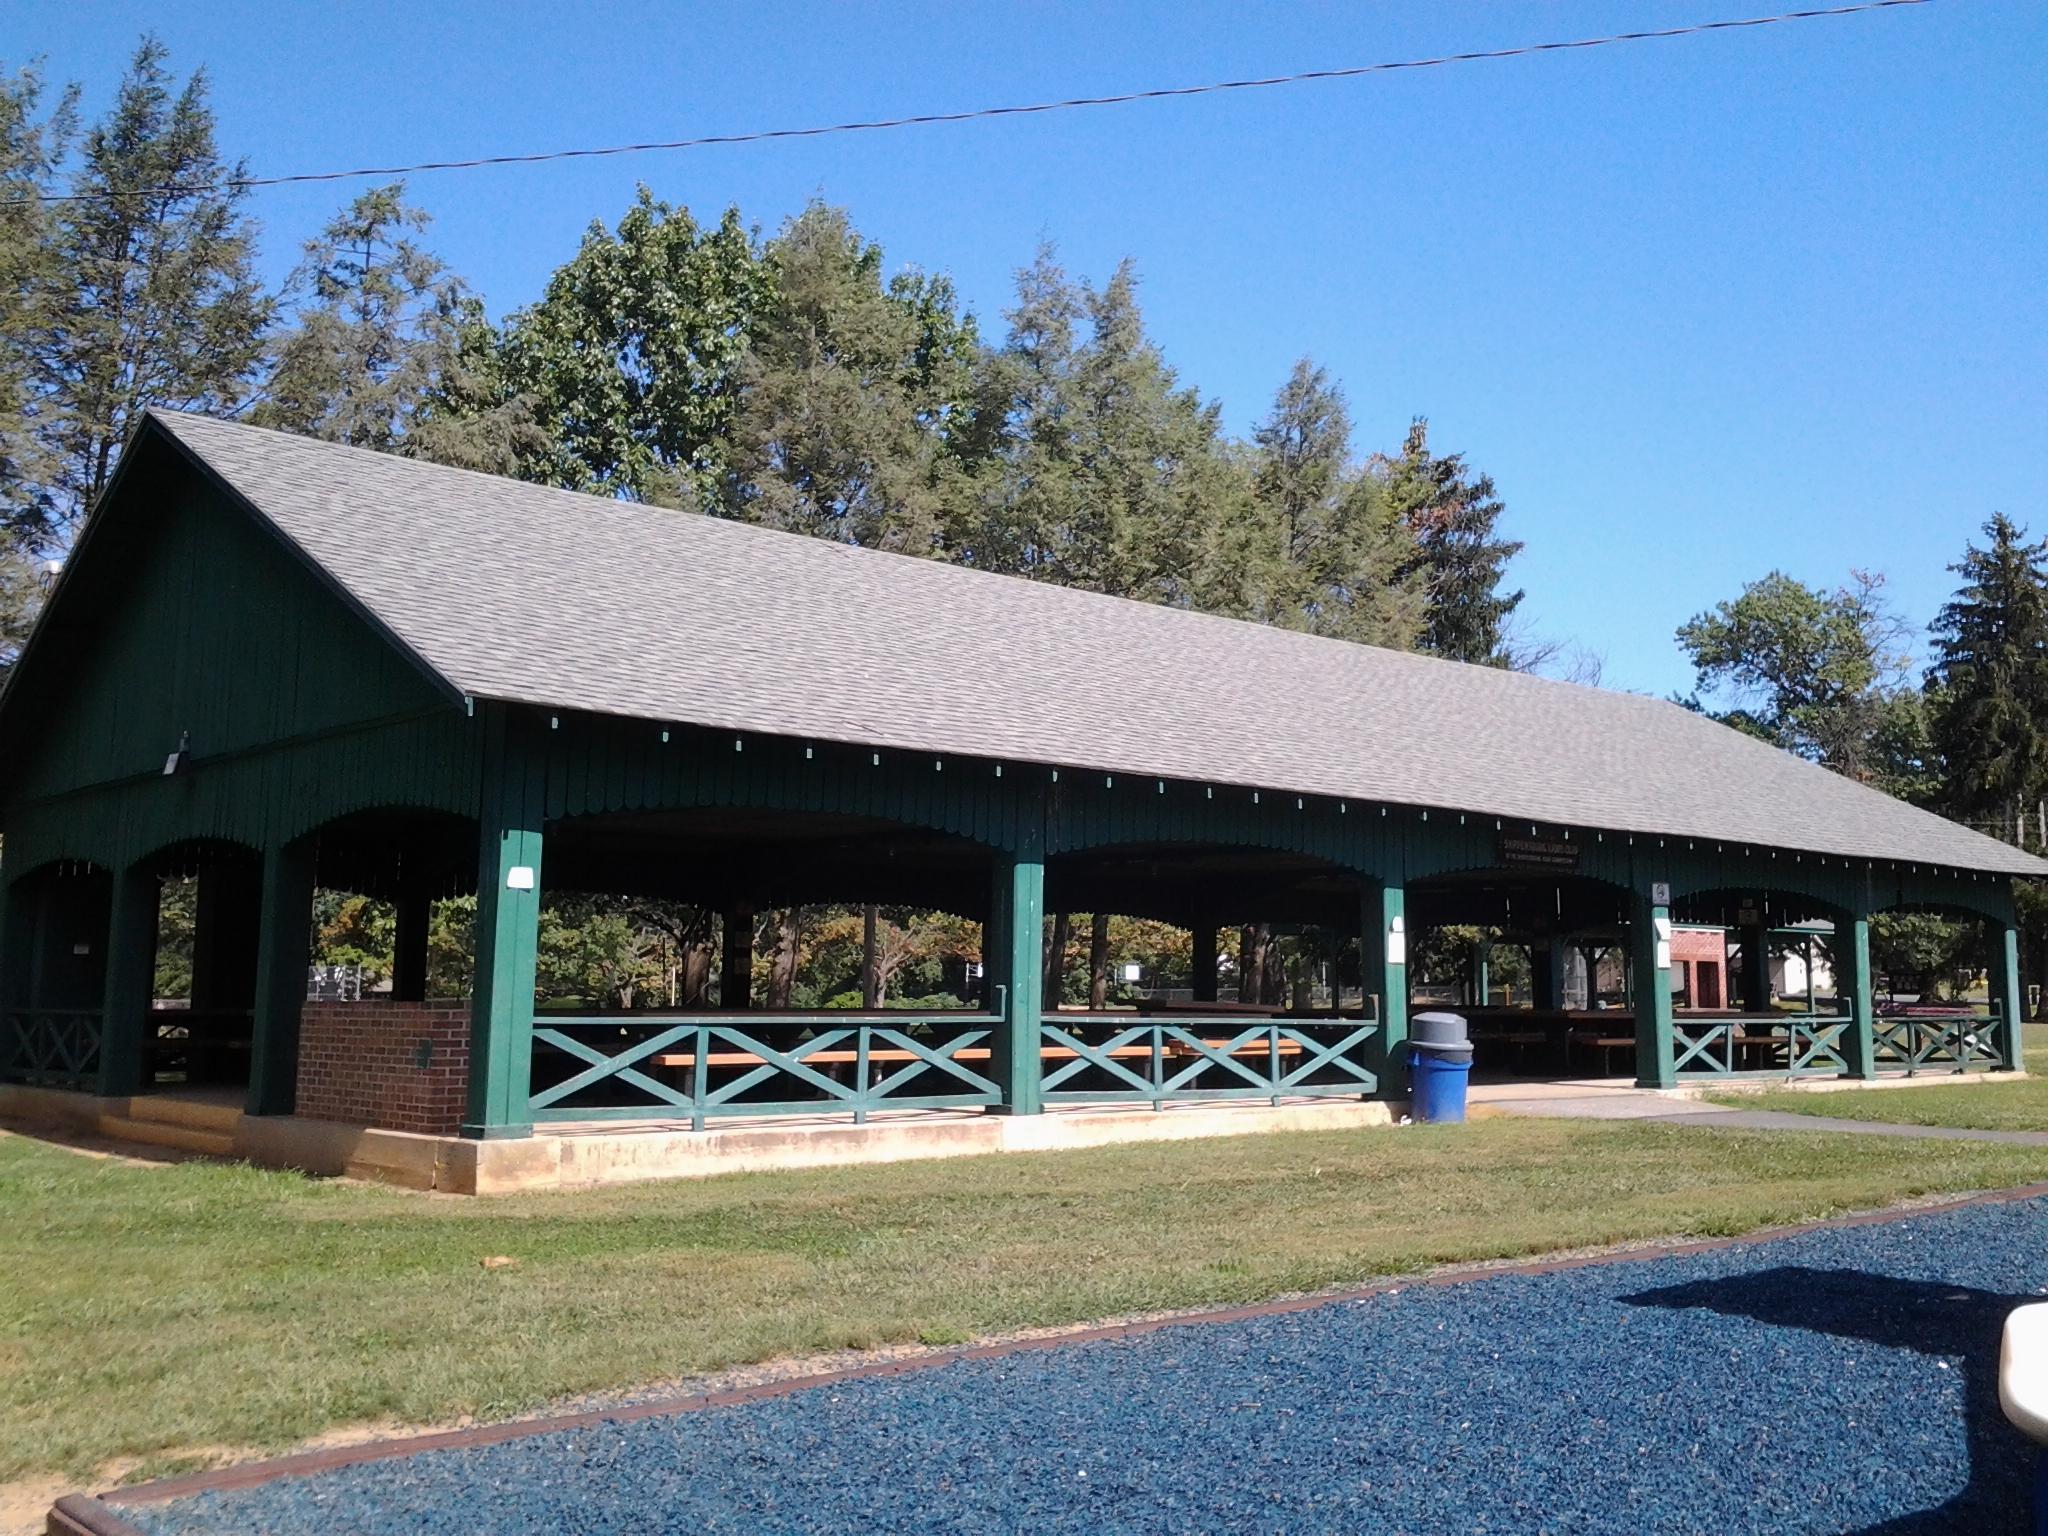 Lion's Club Pavilion $85 Weekends, $50 Weekdays